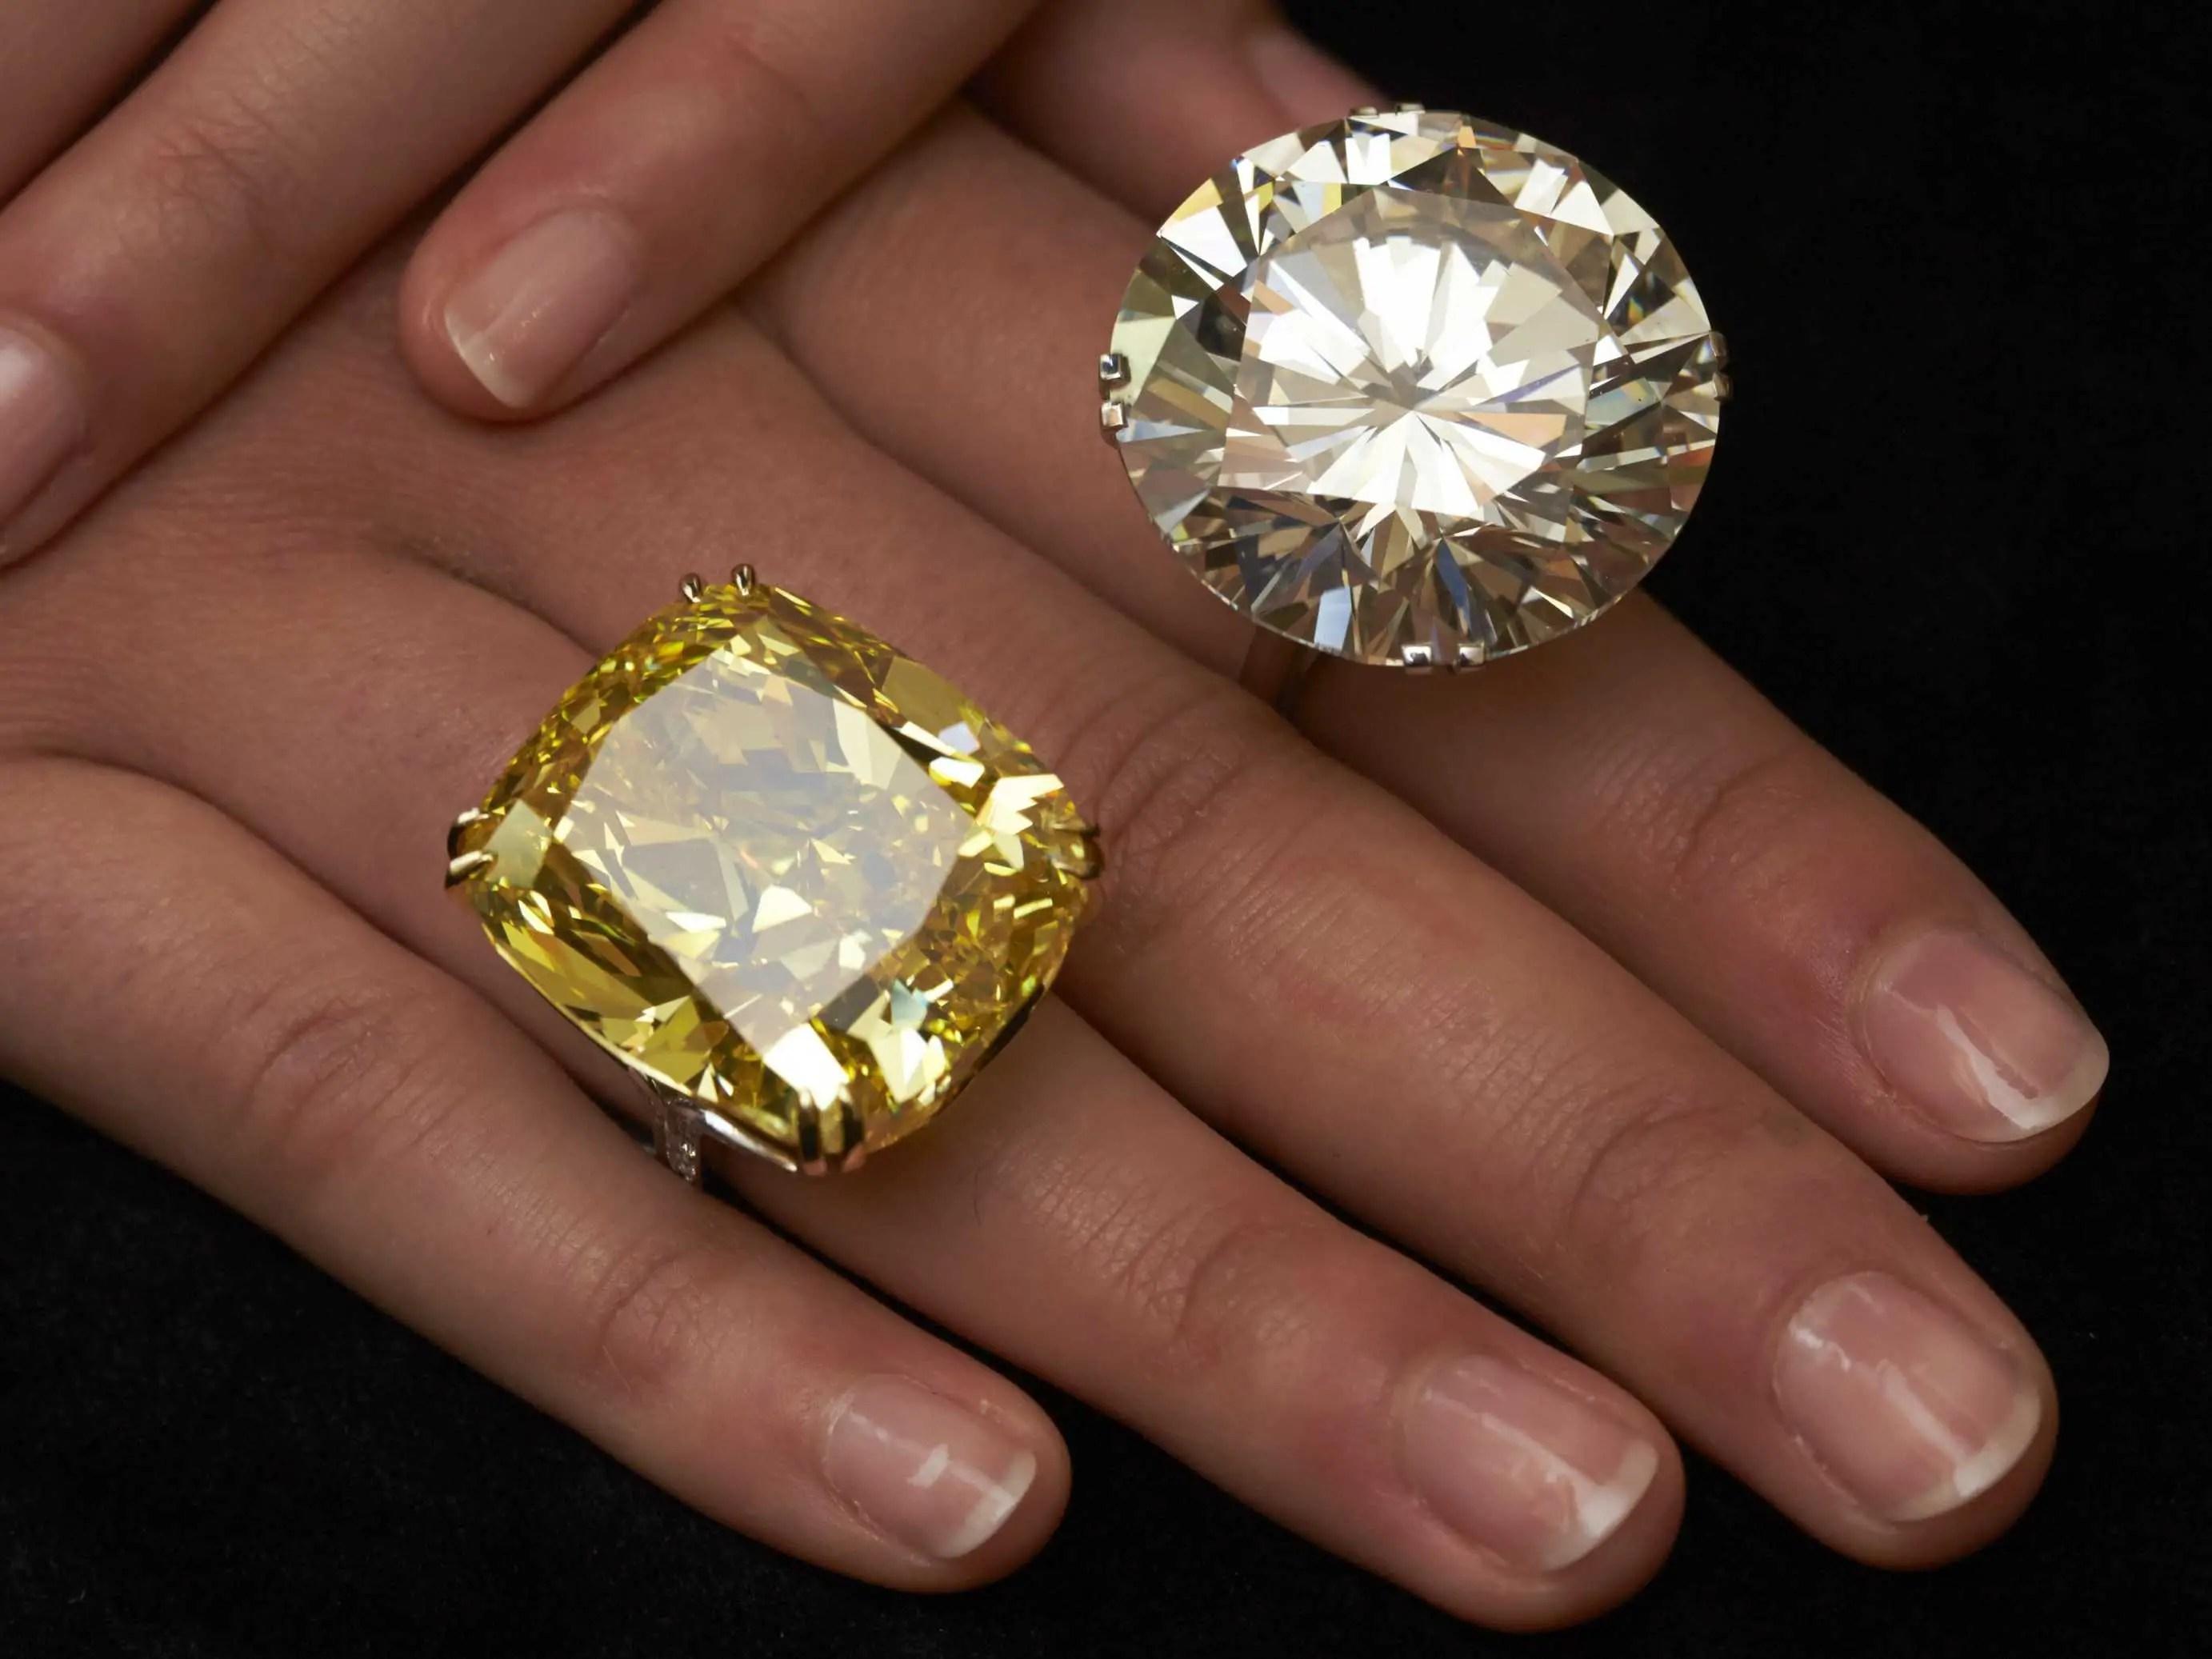 5 Ways To Spot A Fake Diamond Business Insider